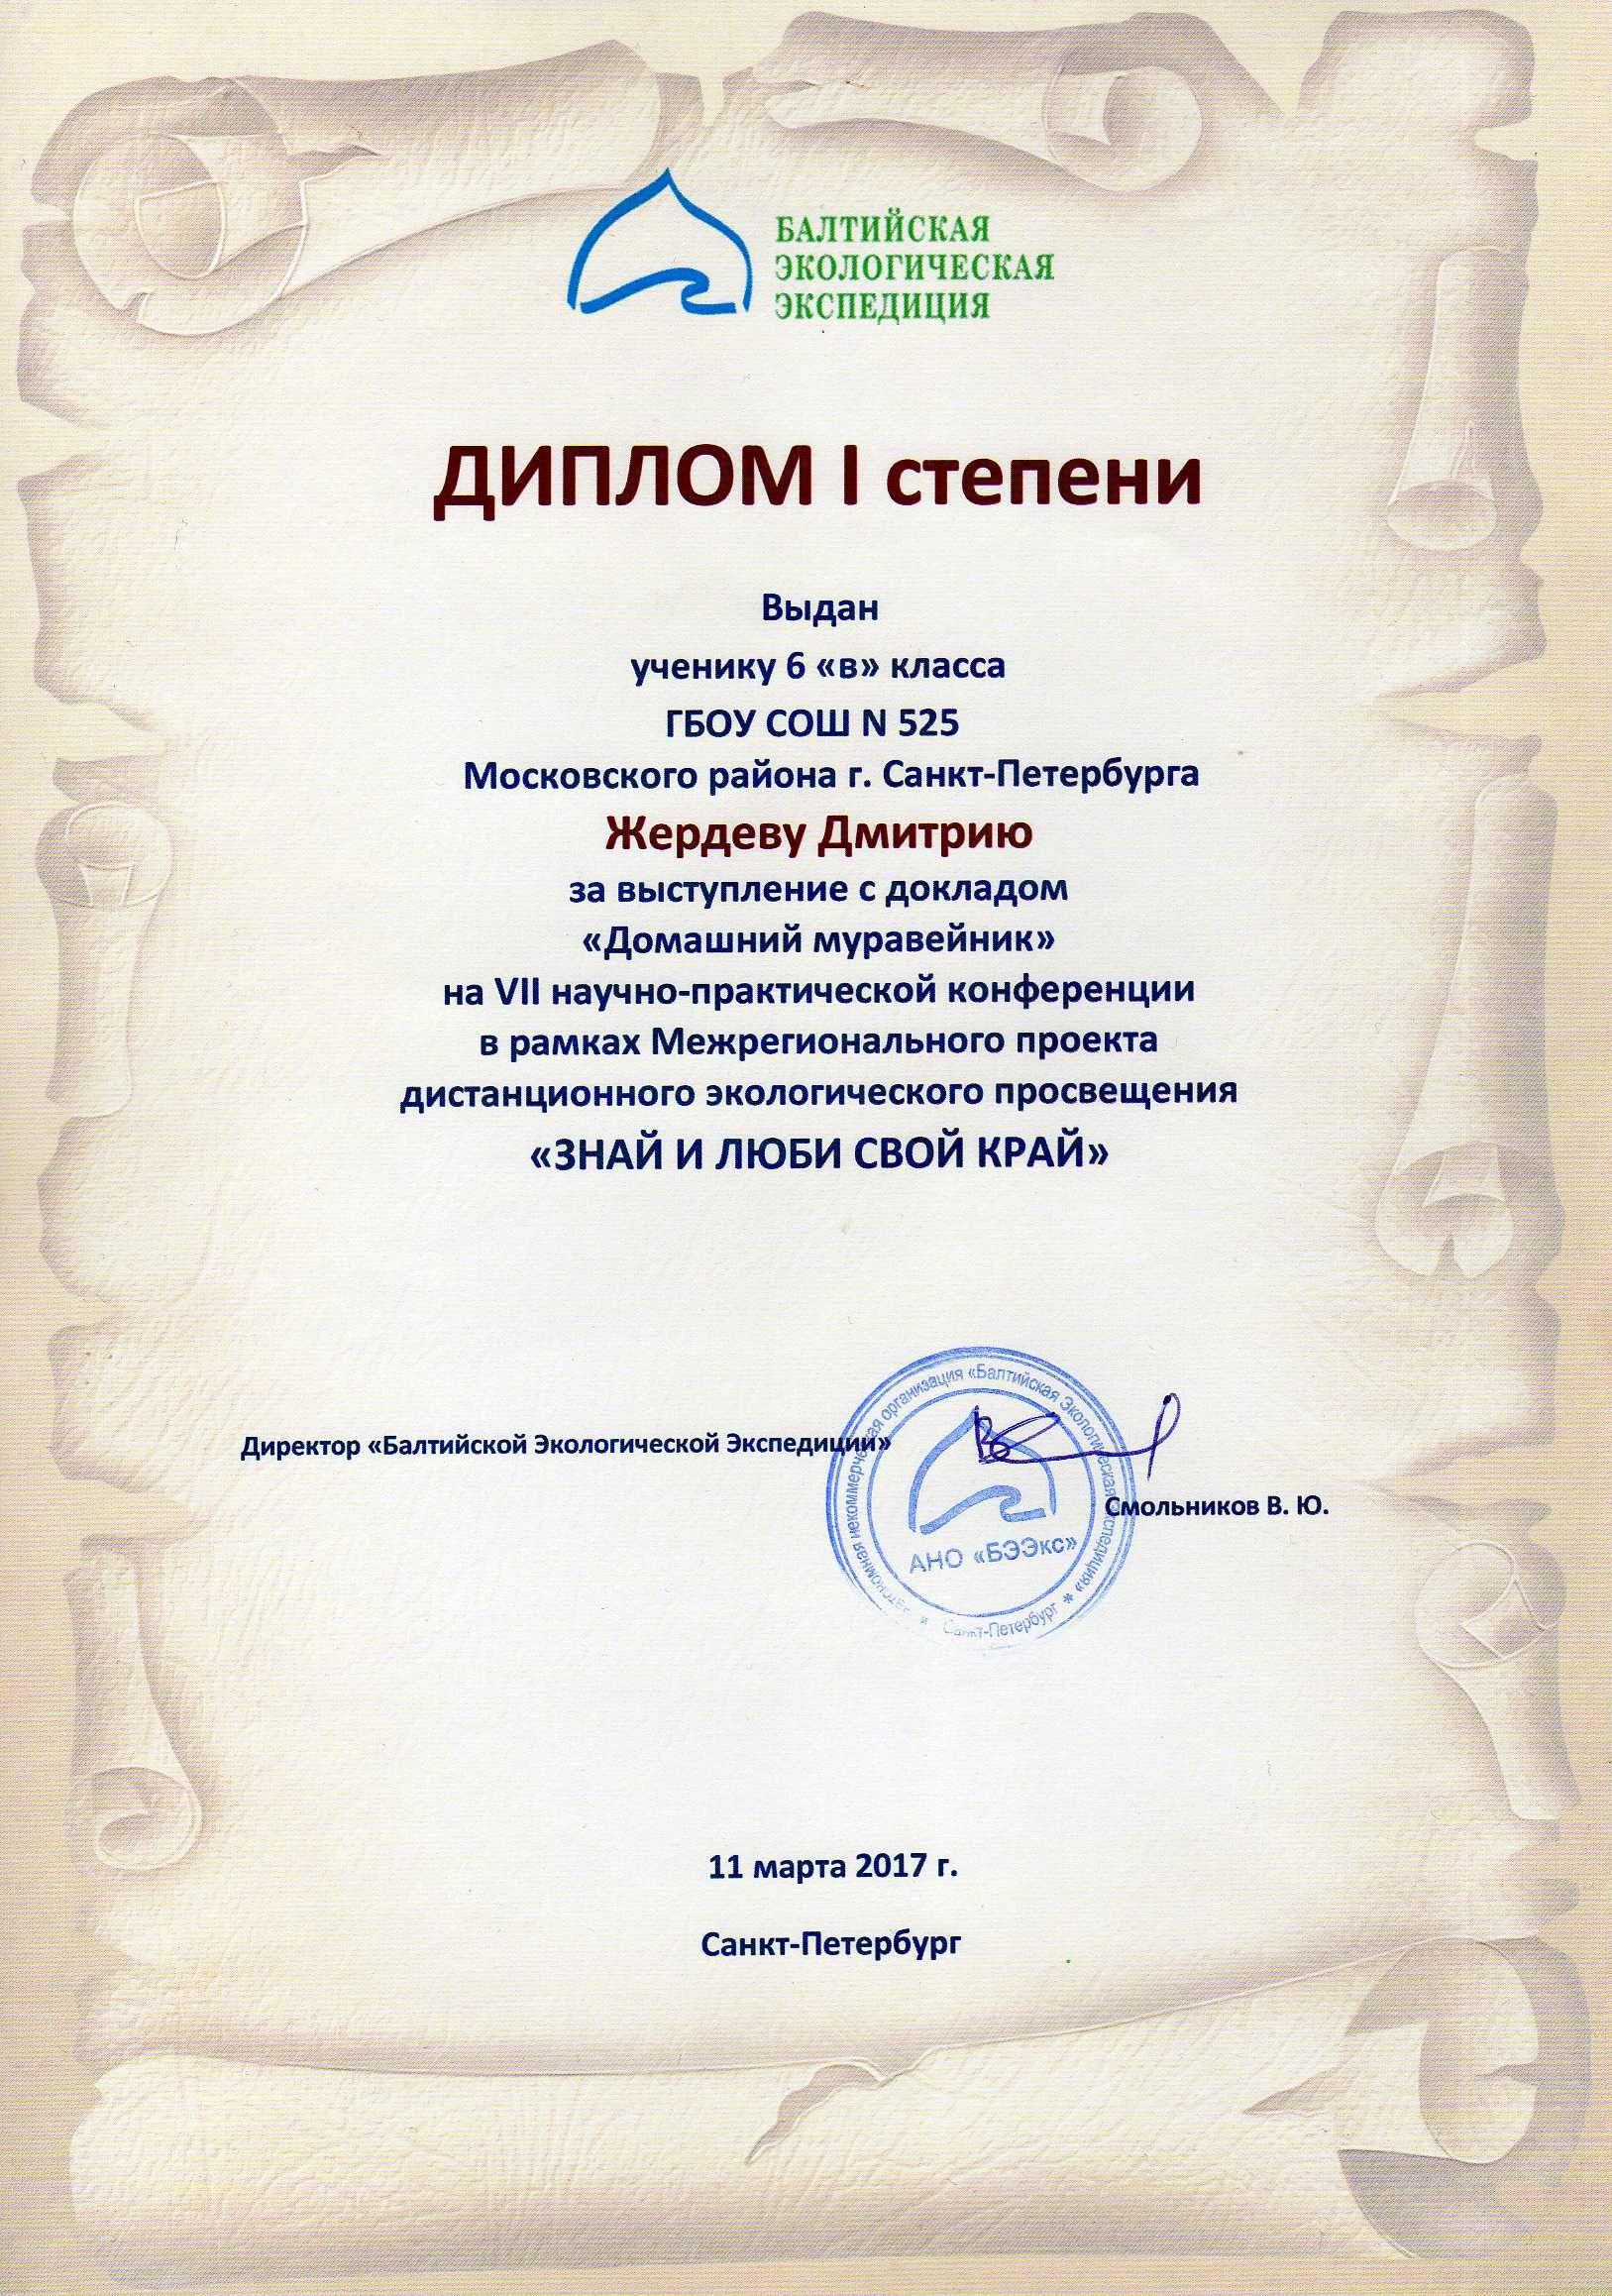 Решебник для 5 класса по математике с.а.козлова а.г.рубин